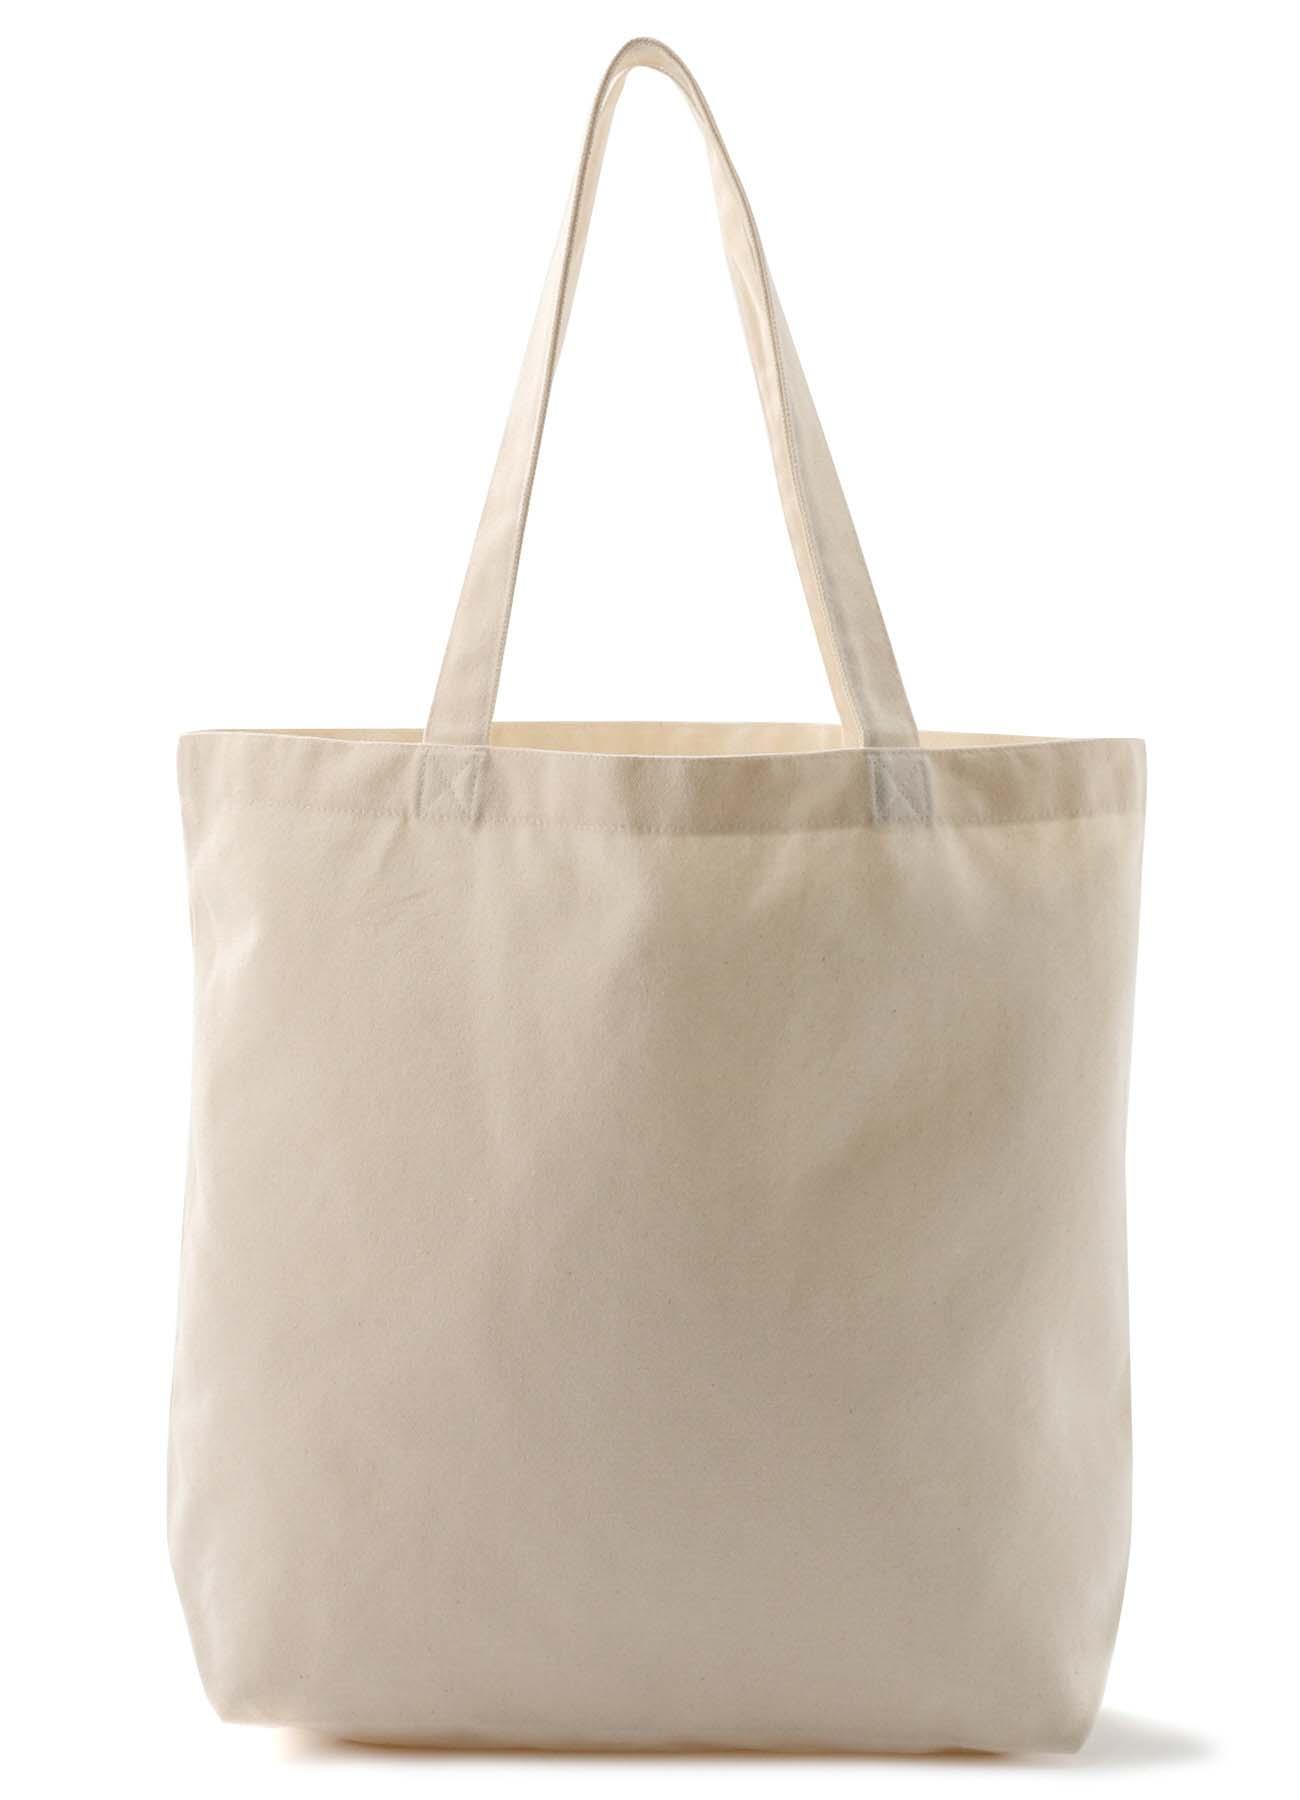 Tote Cotton Canvas Message Tote Bag